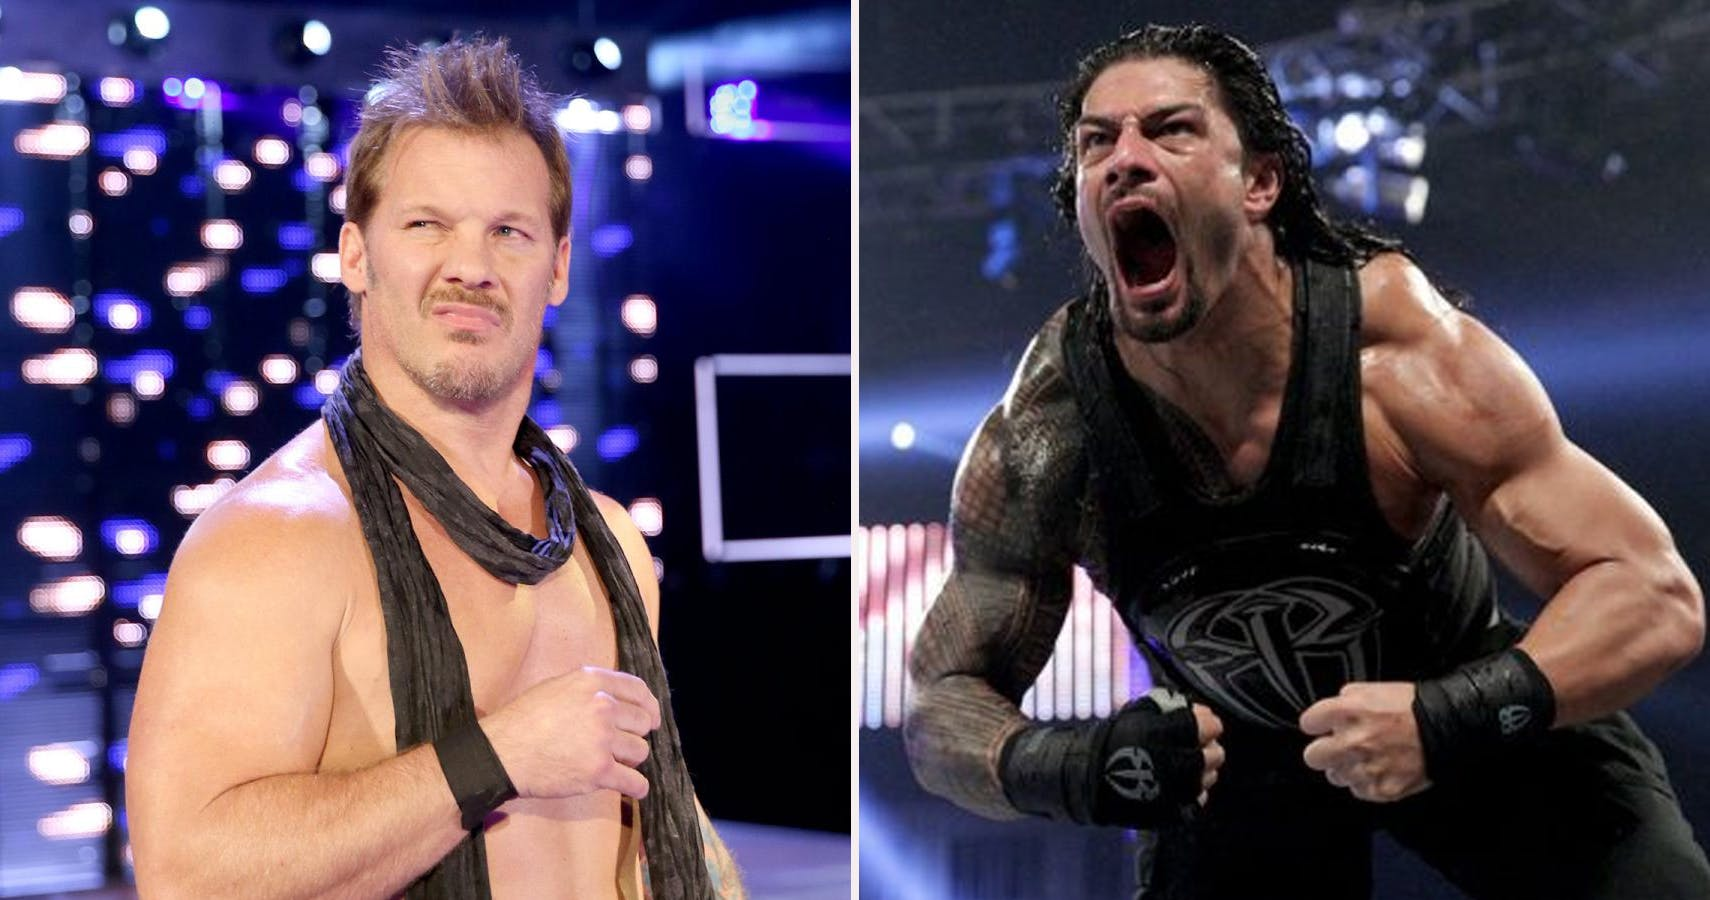 Chris-Jericho-Roman-Reigns